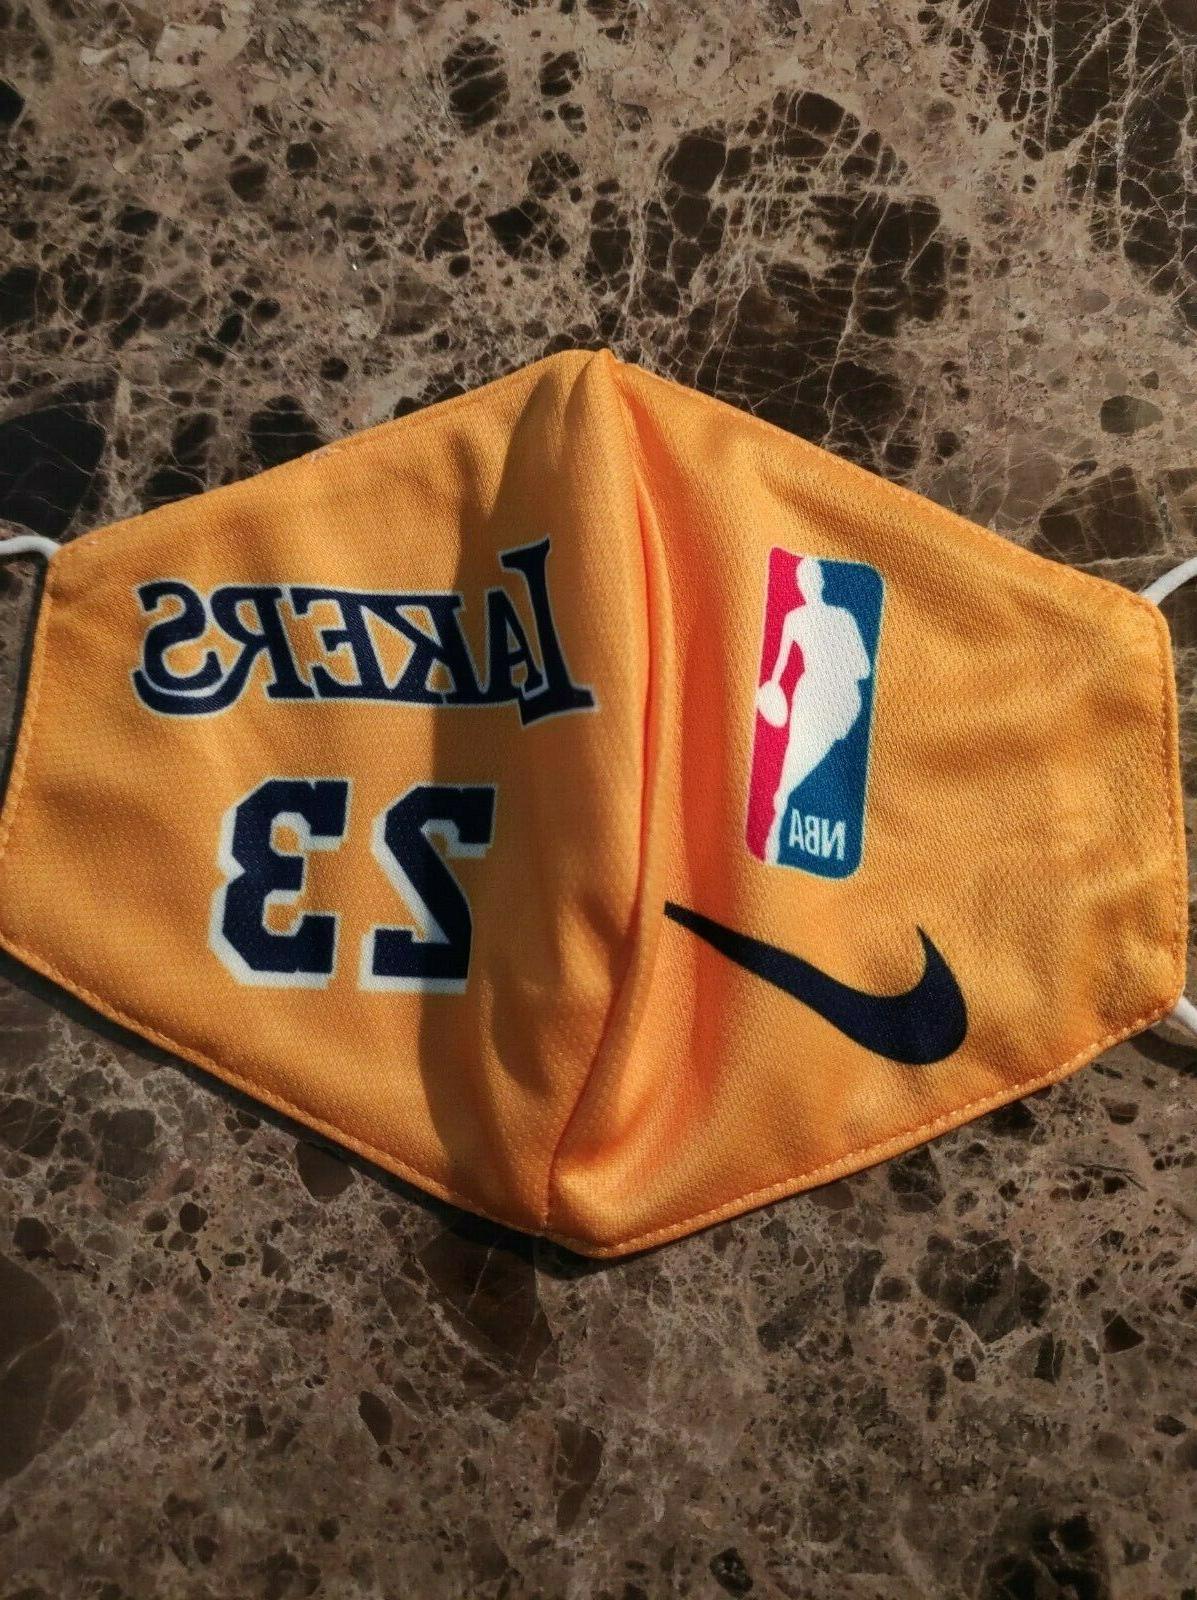 Lakers #23 Face Mask Pocket